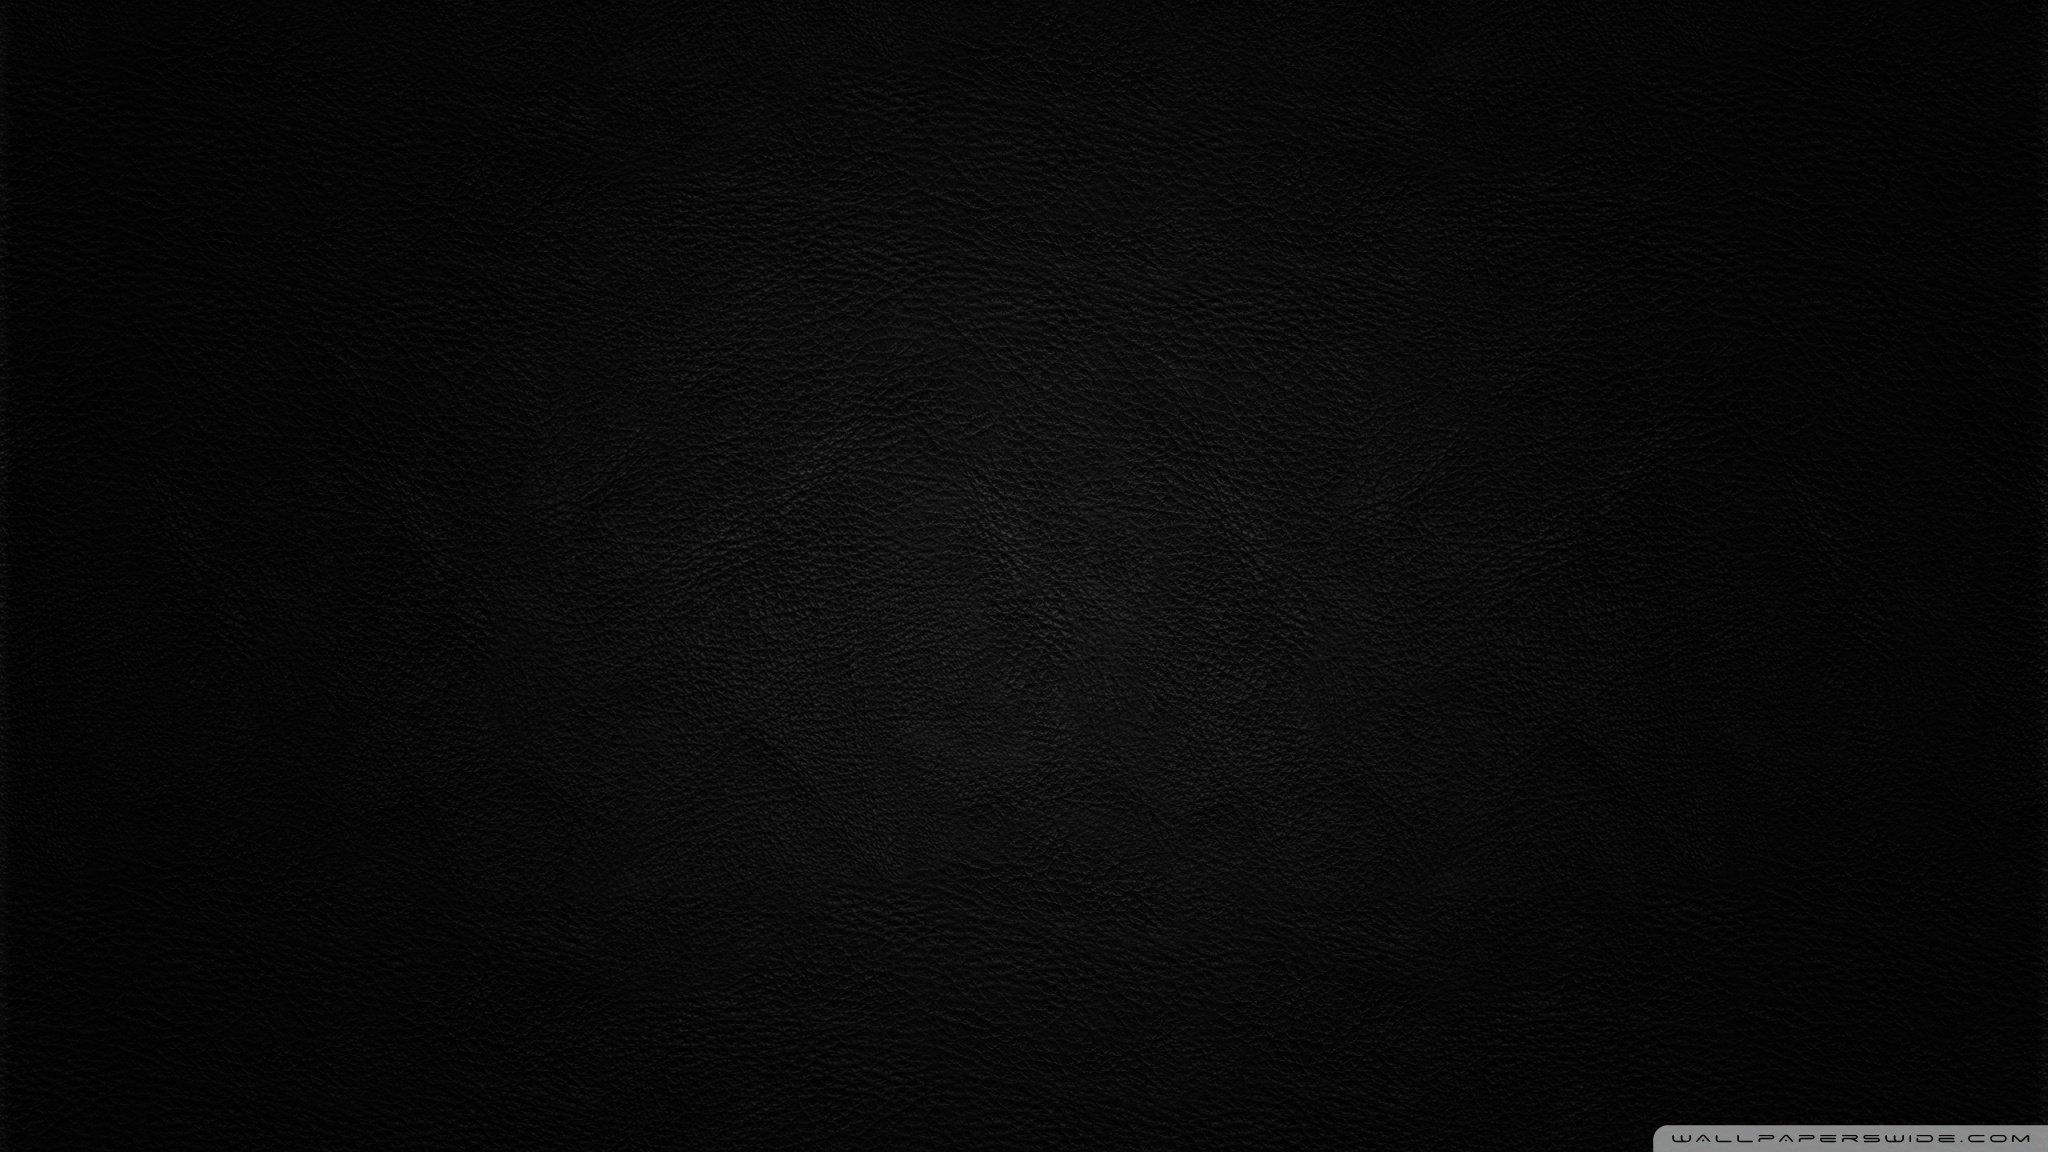 Photo 2048 X 1152 Pixels